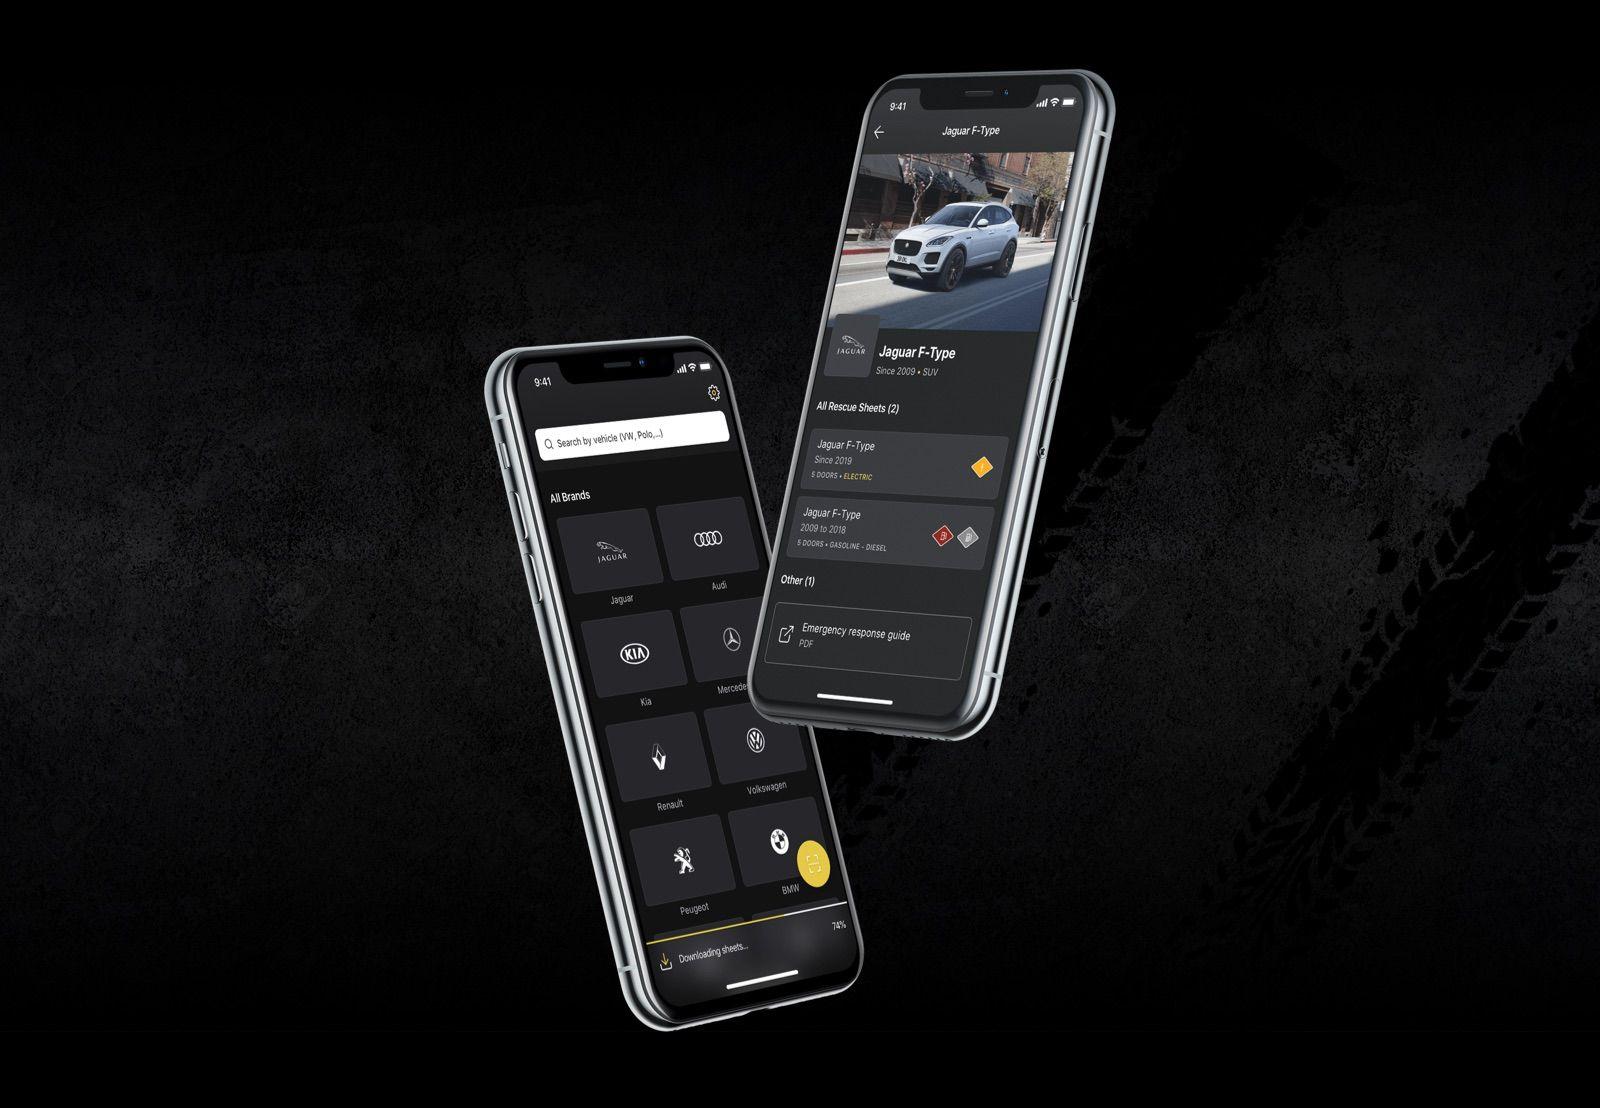 Screenshots of the Euro NCAP app